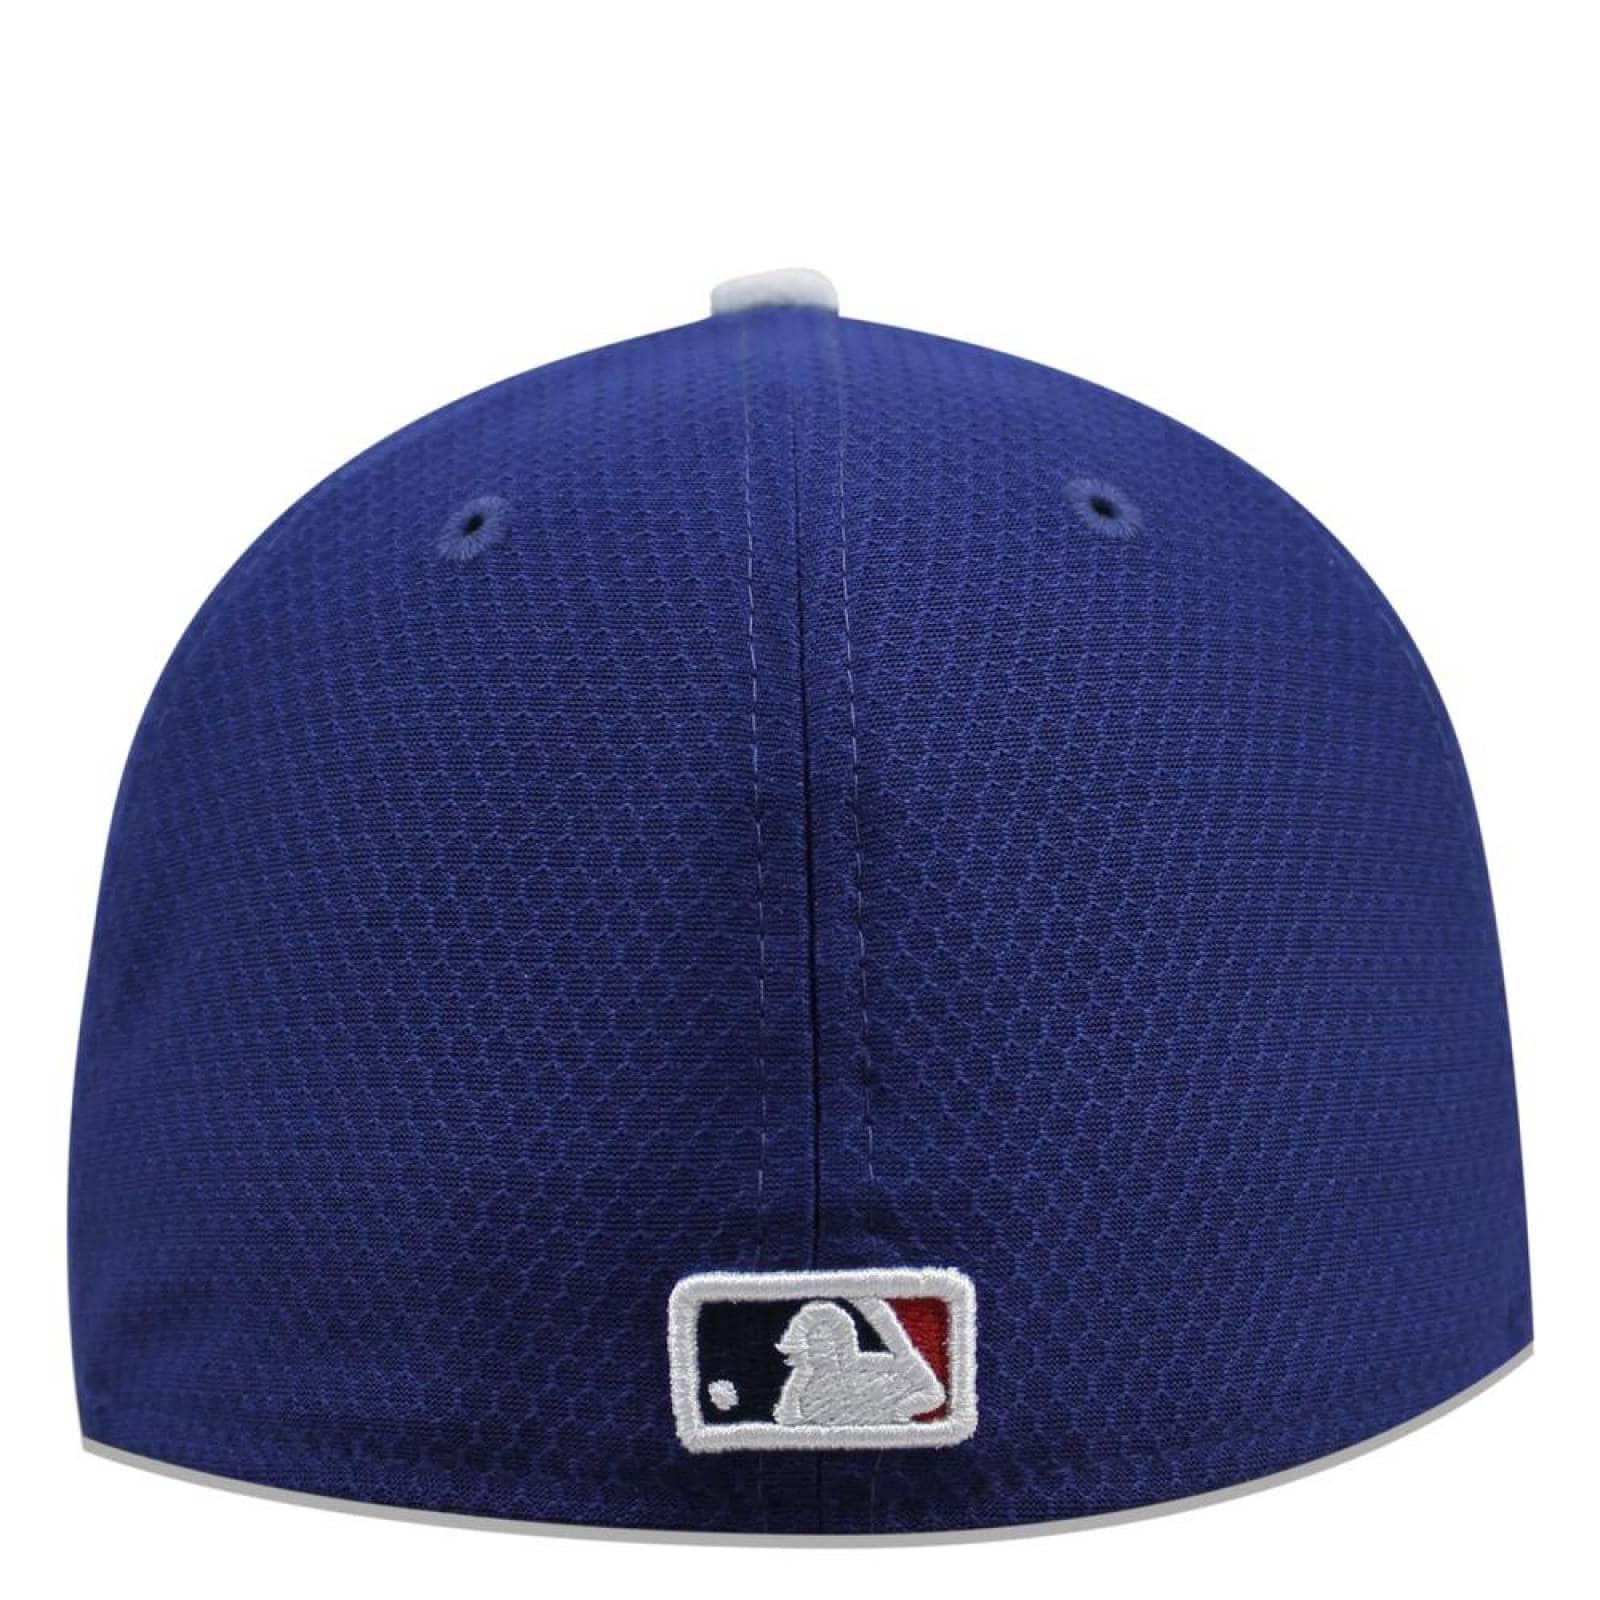 Gorra New Era 59 Fifty MLB Dodgers Batting Practice Azul